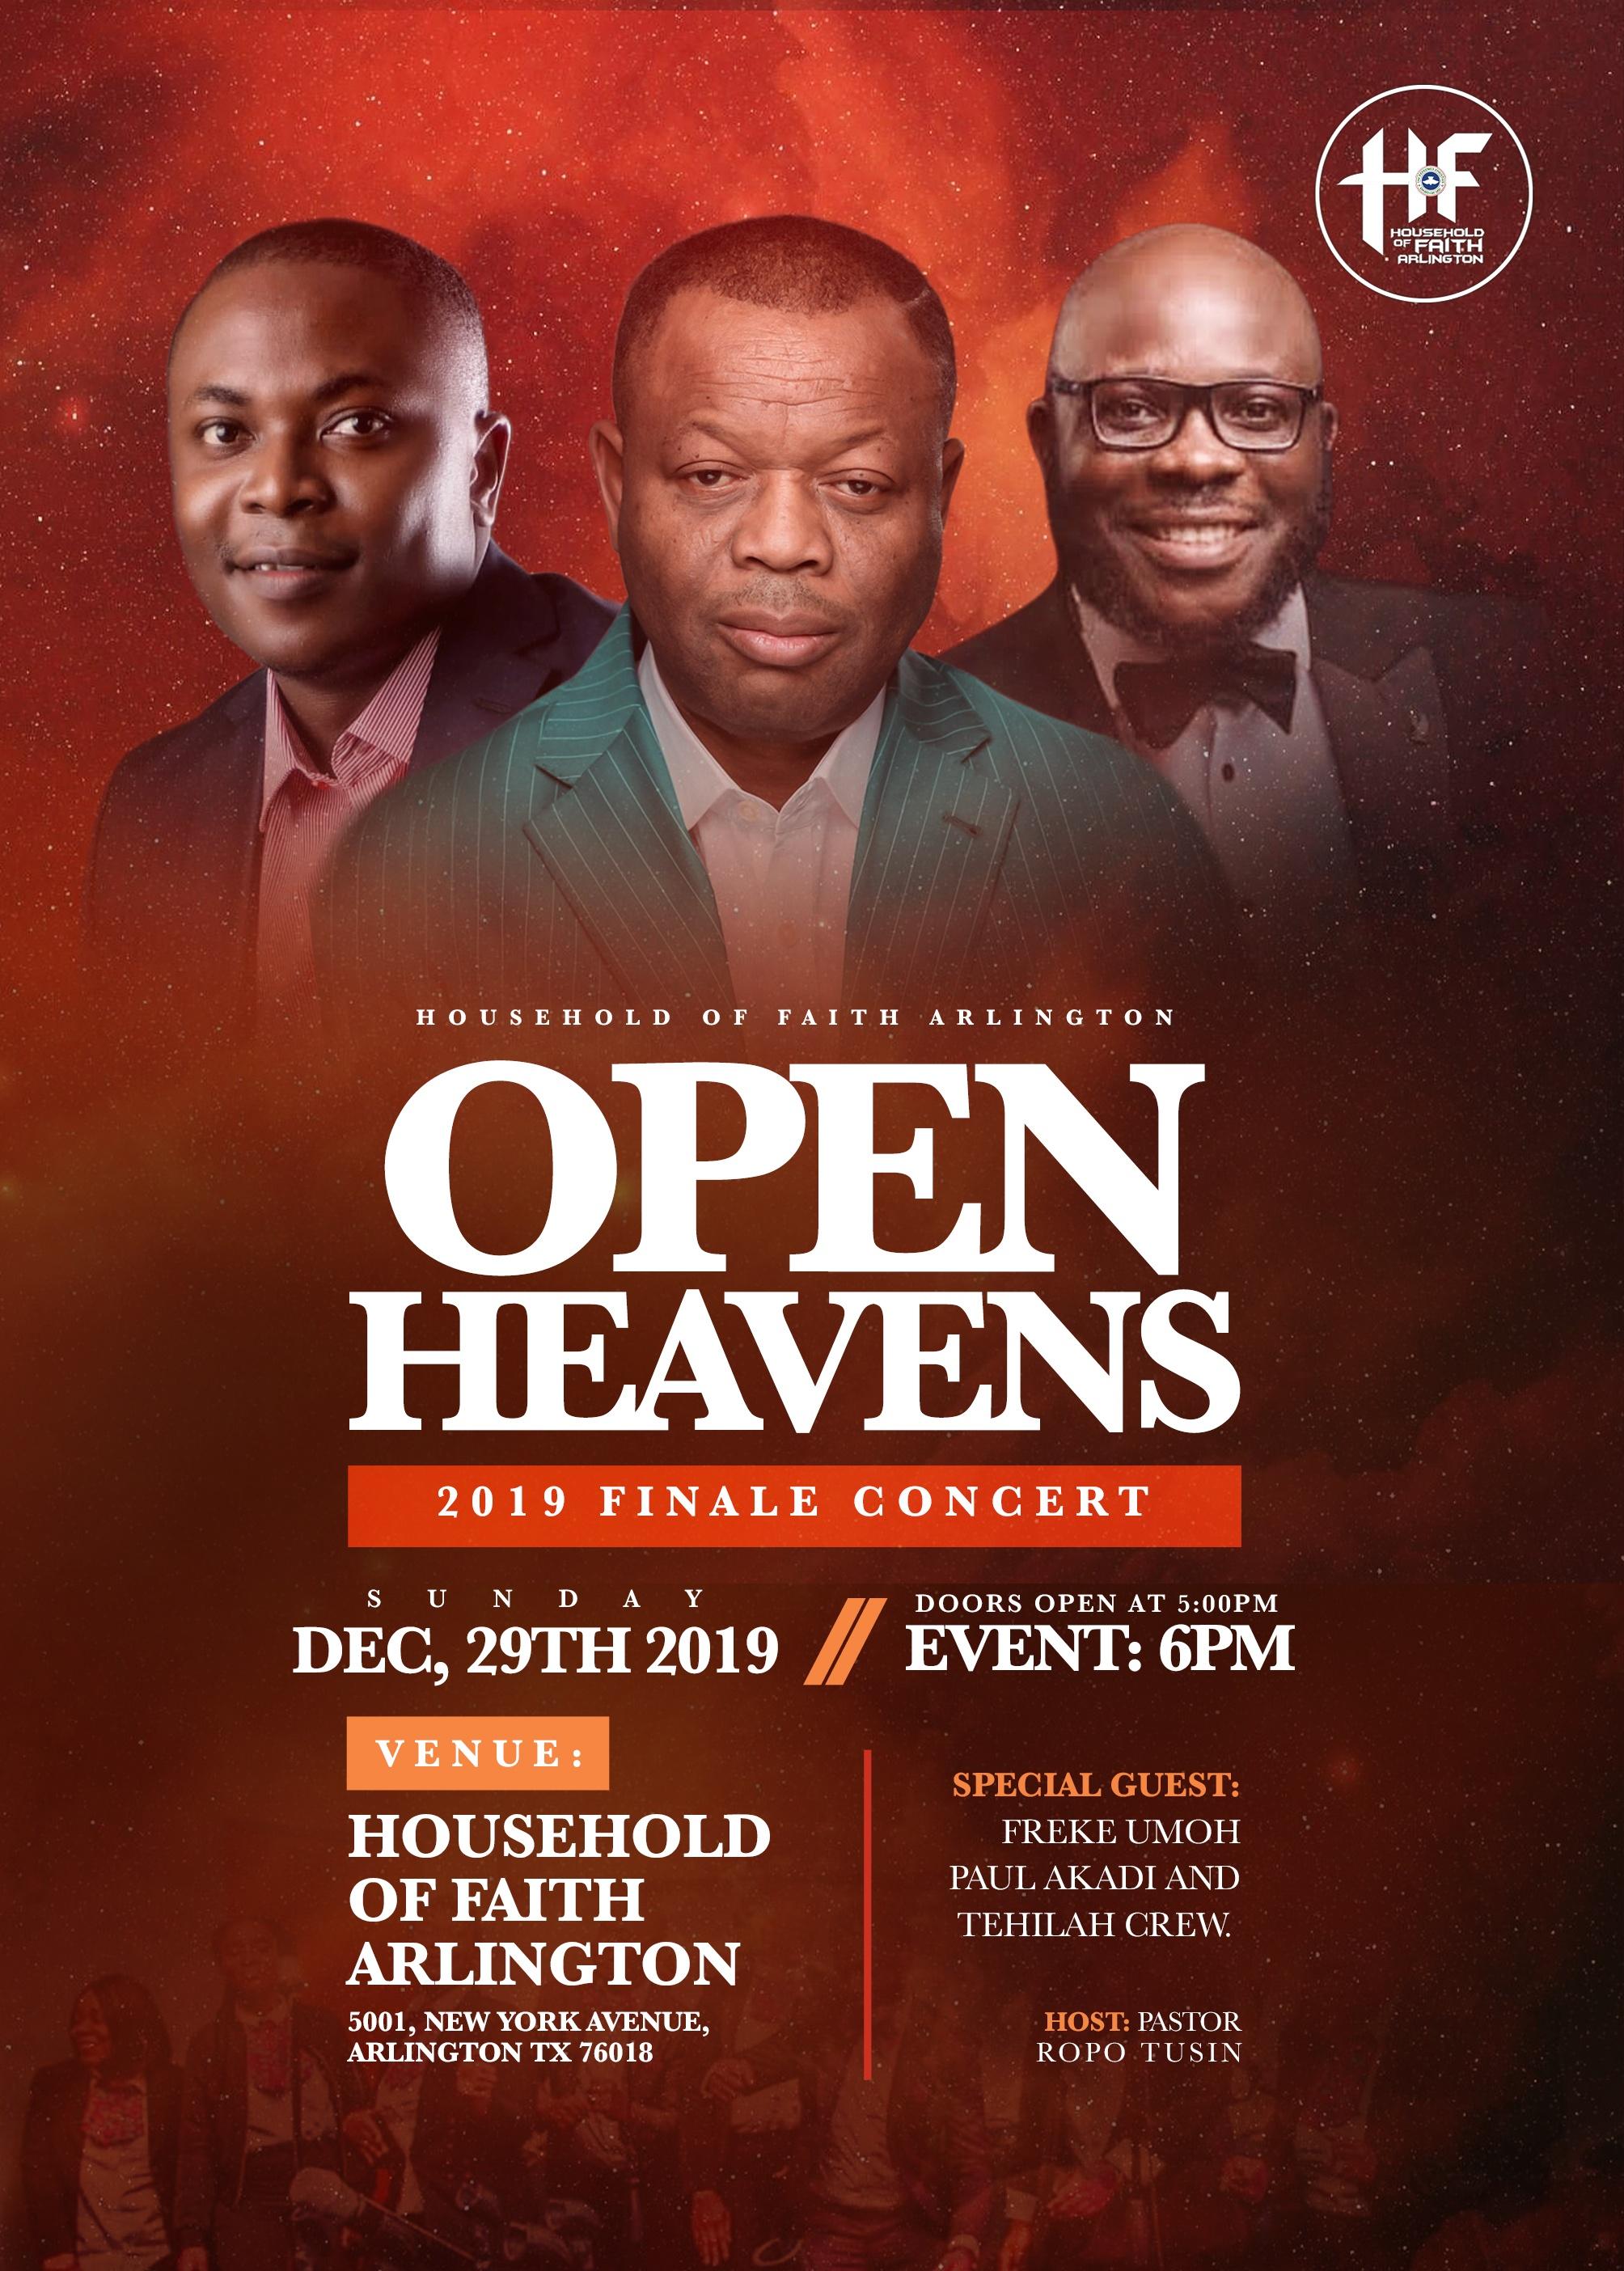 Open Heavens Finale Concert